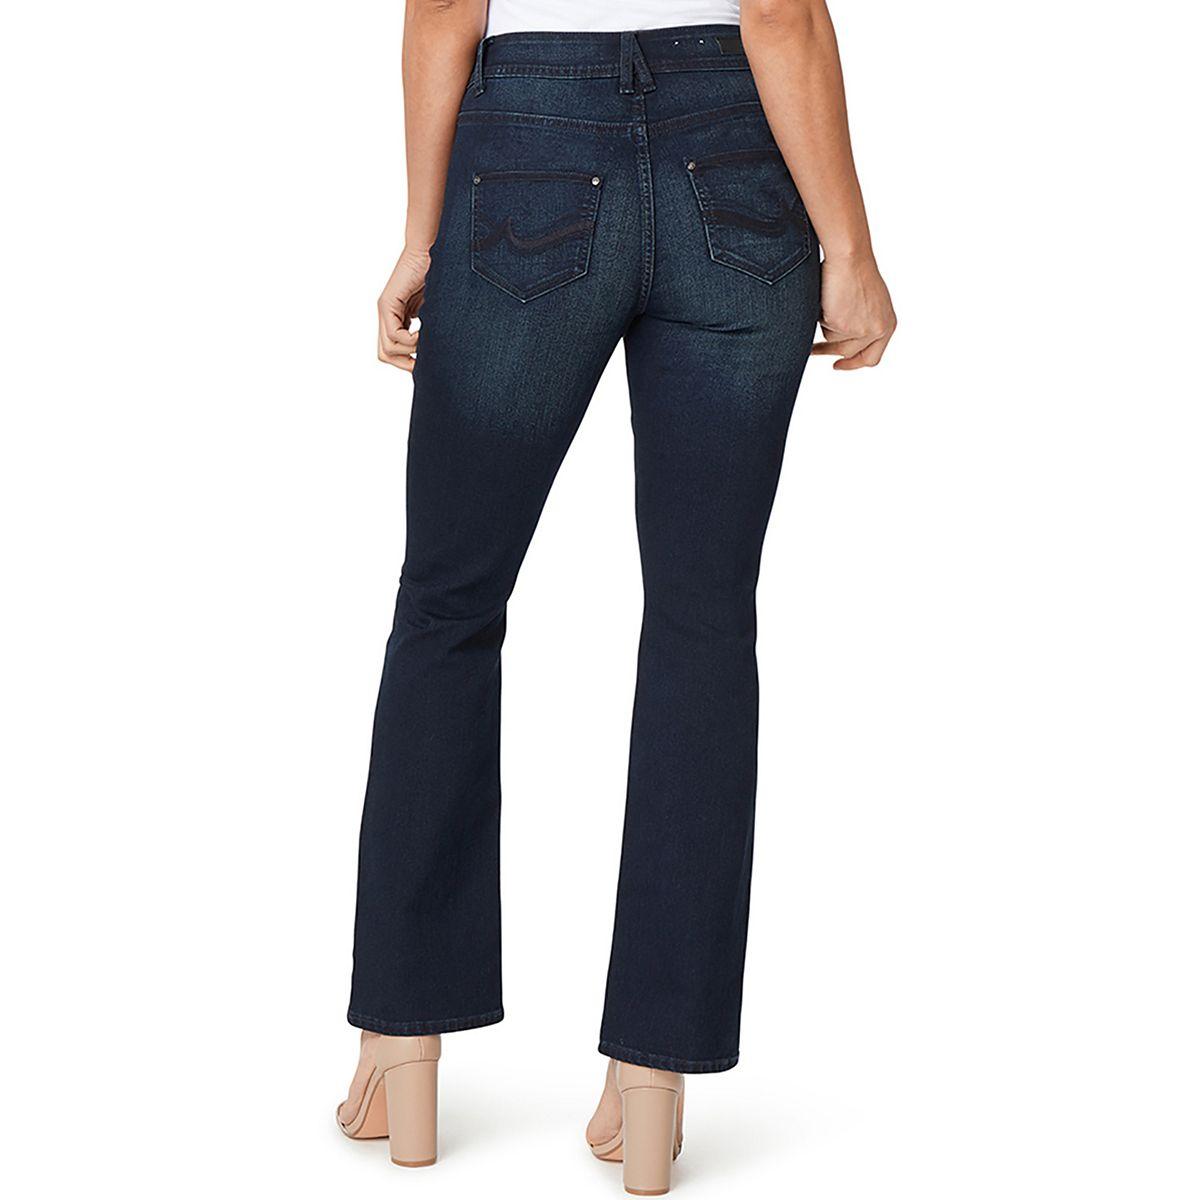 Women's Angels Curvy Fit Bootcut Jeans Amaryllis vTAuR